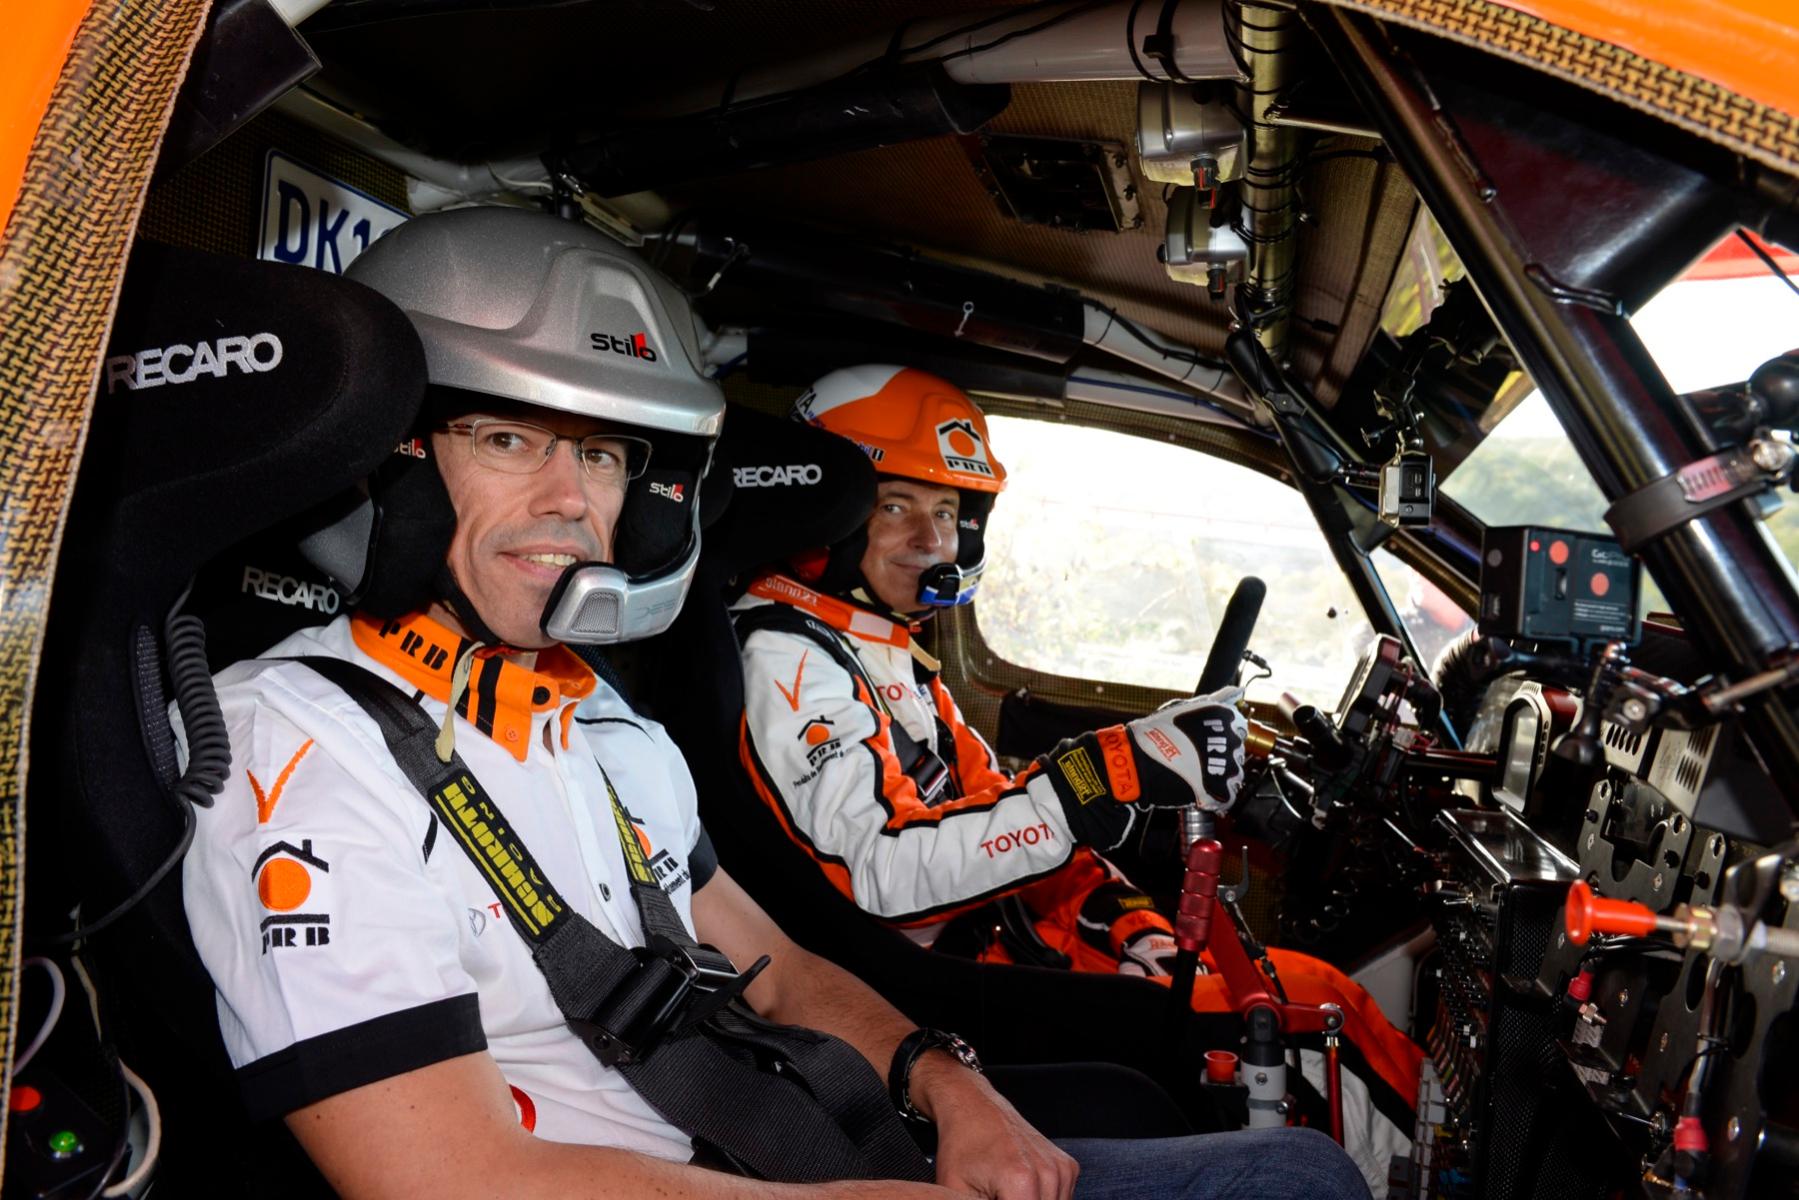 Toyota Hilux Dakar 2016